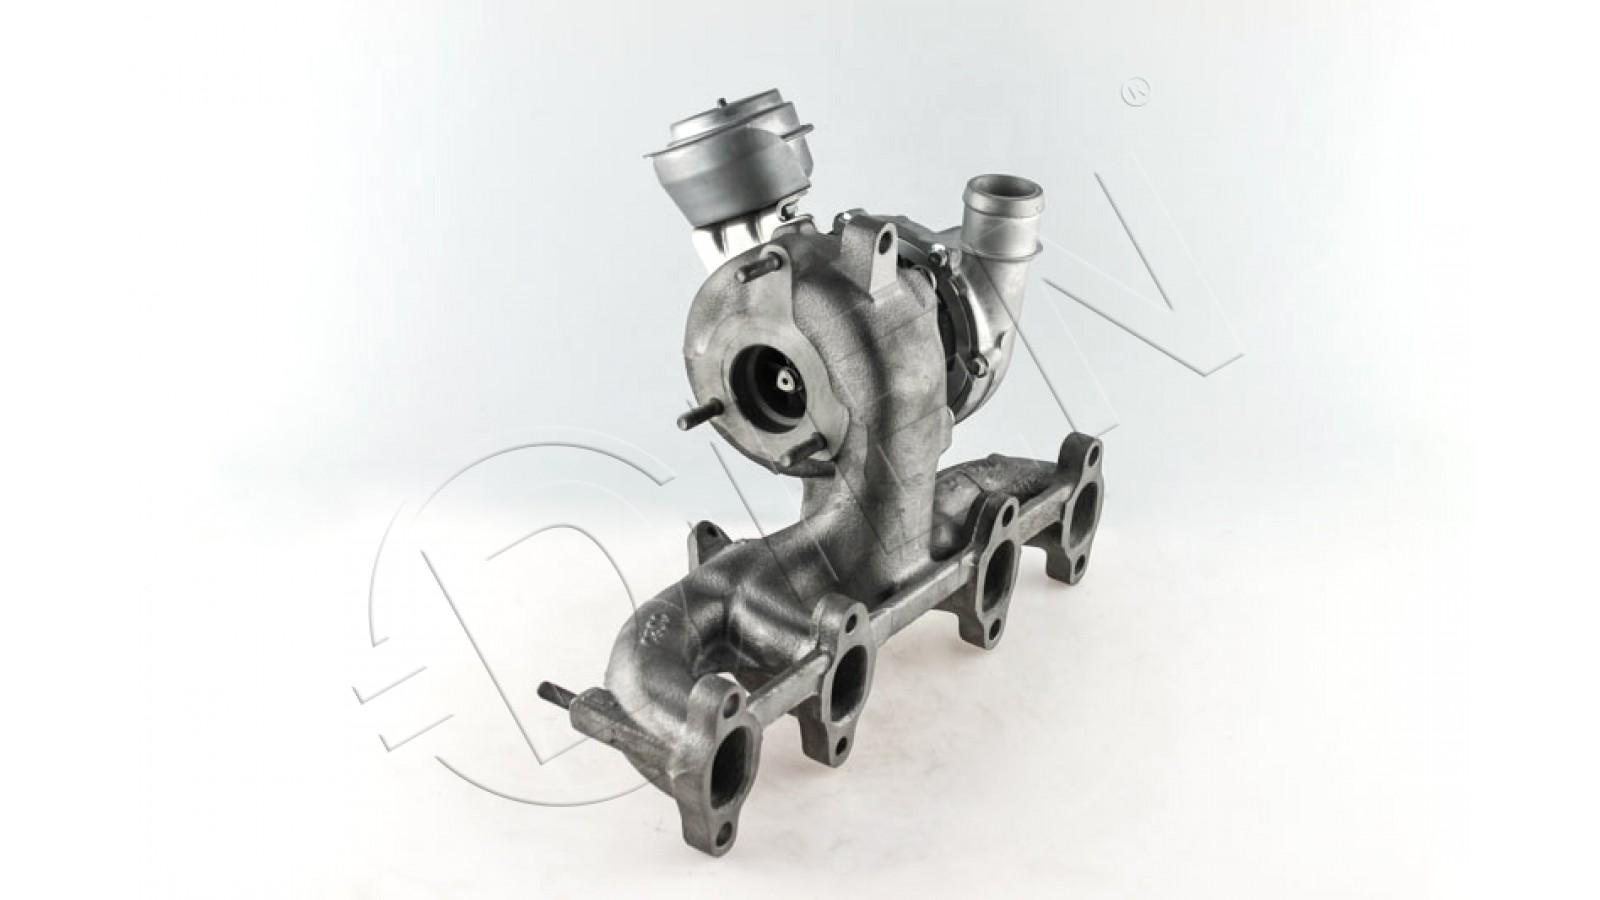 turbina volkswagen golf iv 1 9 tdi 115 cv 713673 5006s. Black Bedroom Furniture Sets. Home Design Ideas